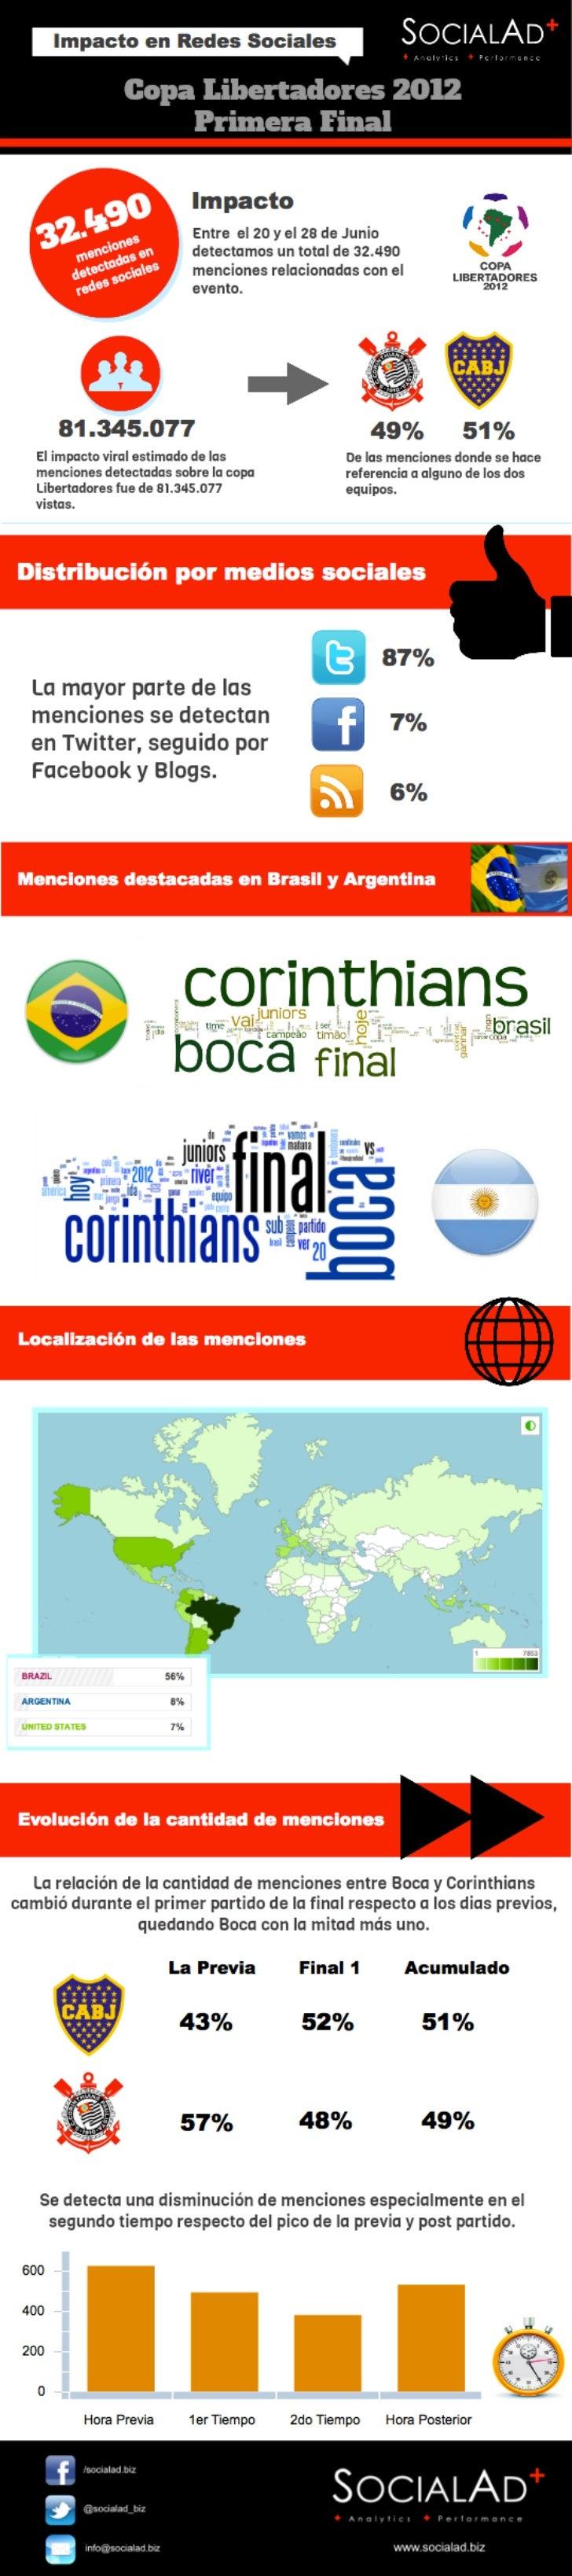 Copa Libertadores Final 1. Impacto en Rede Sociales. SocialAd